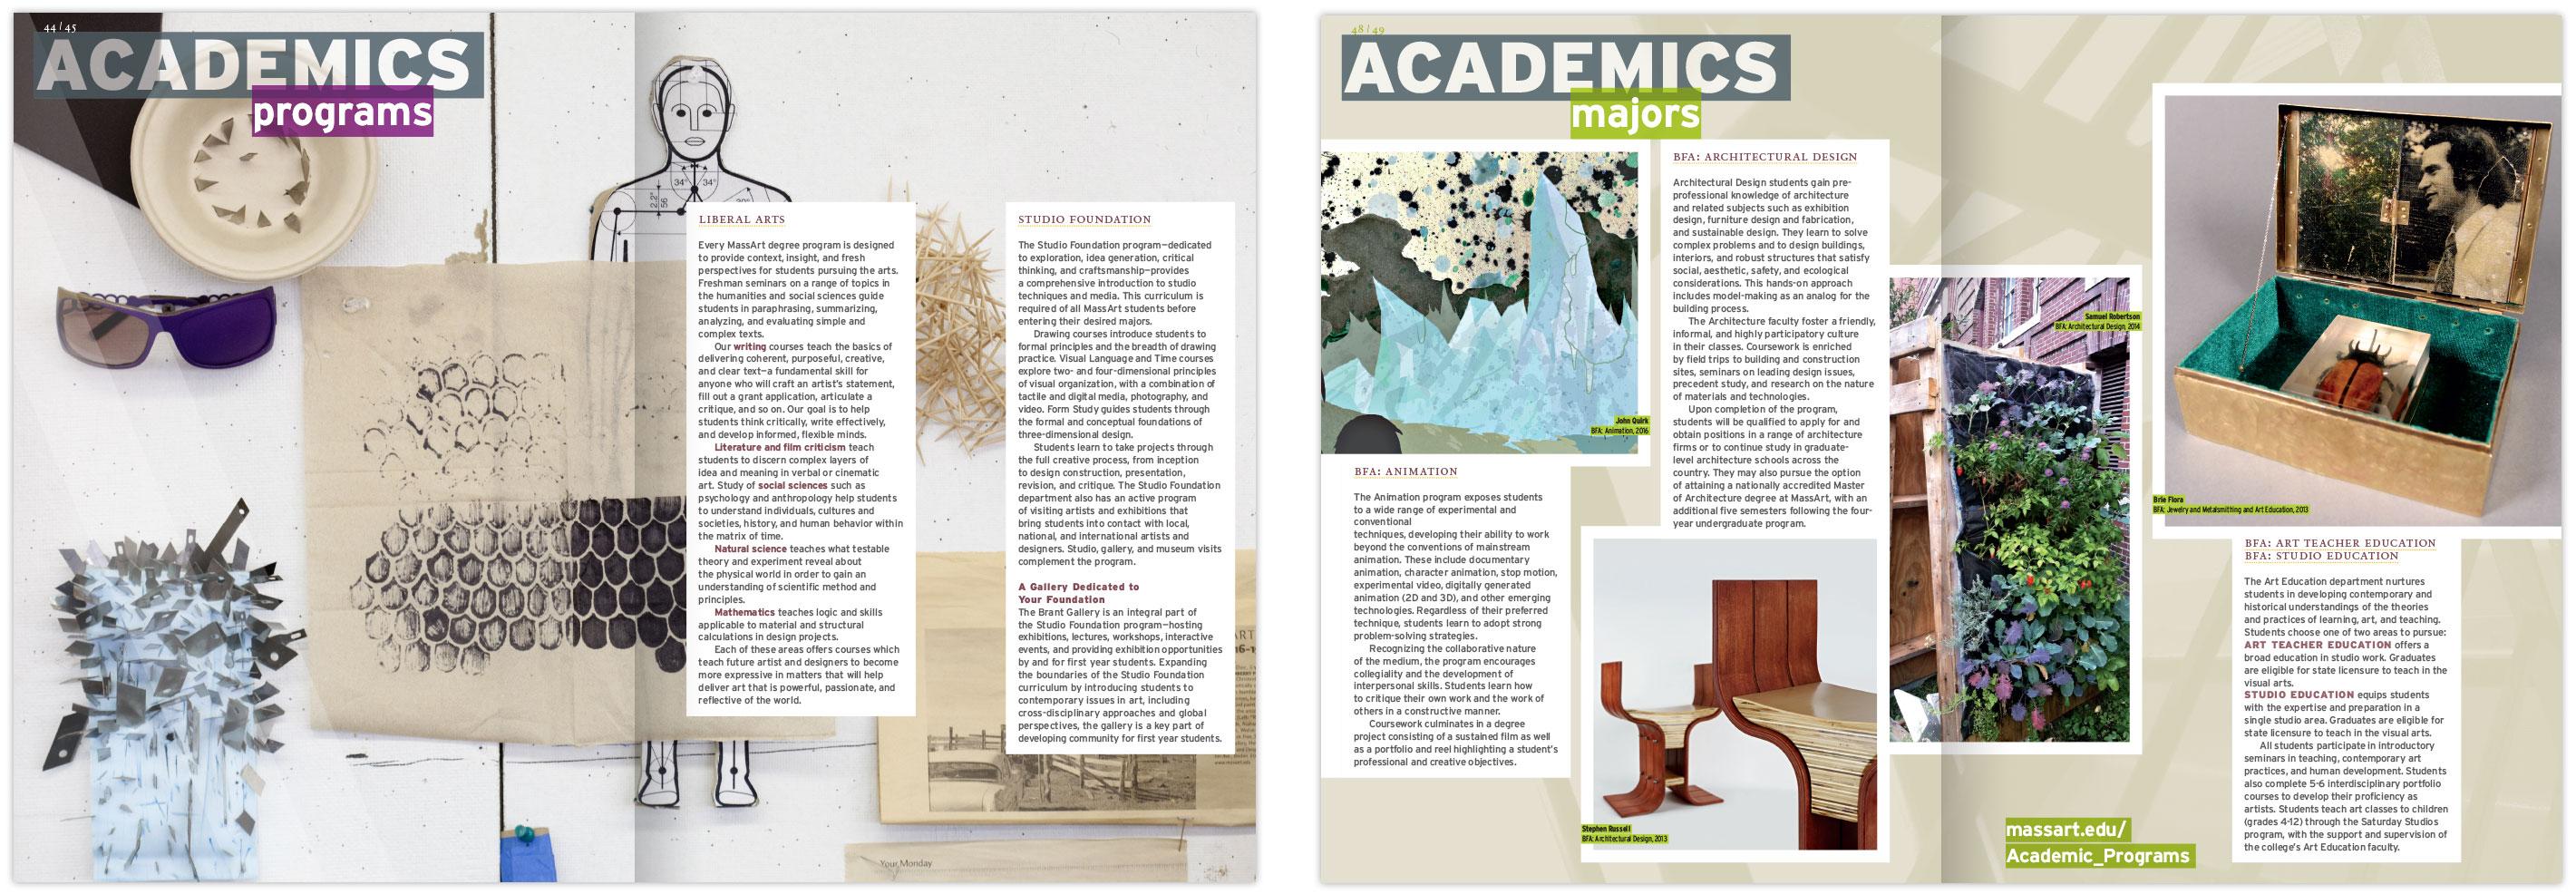 Viewbook academics spread